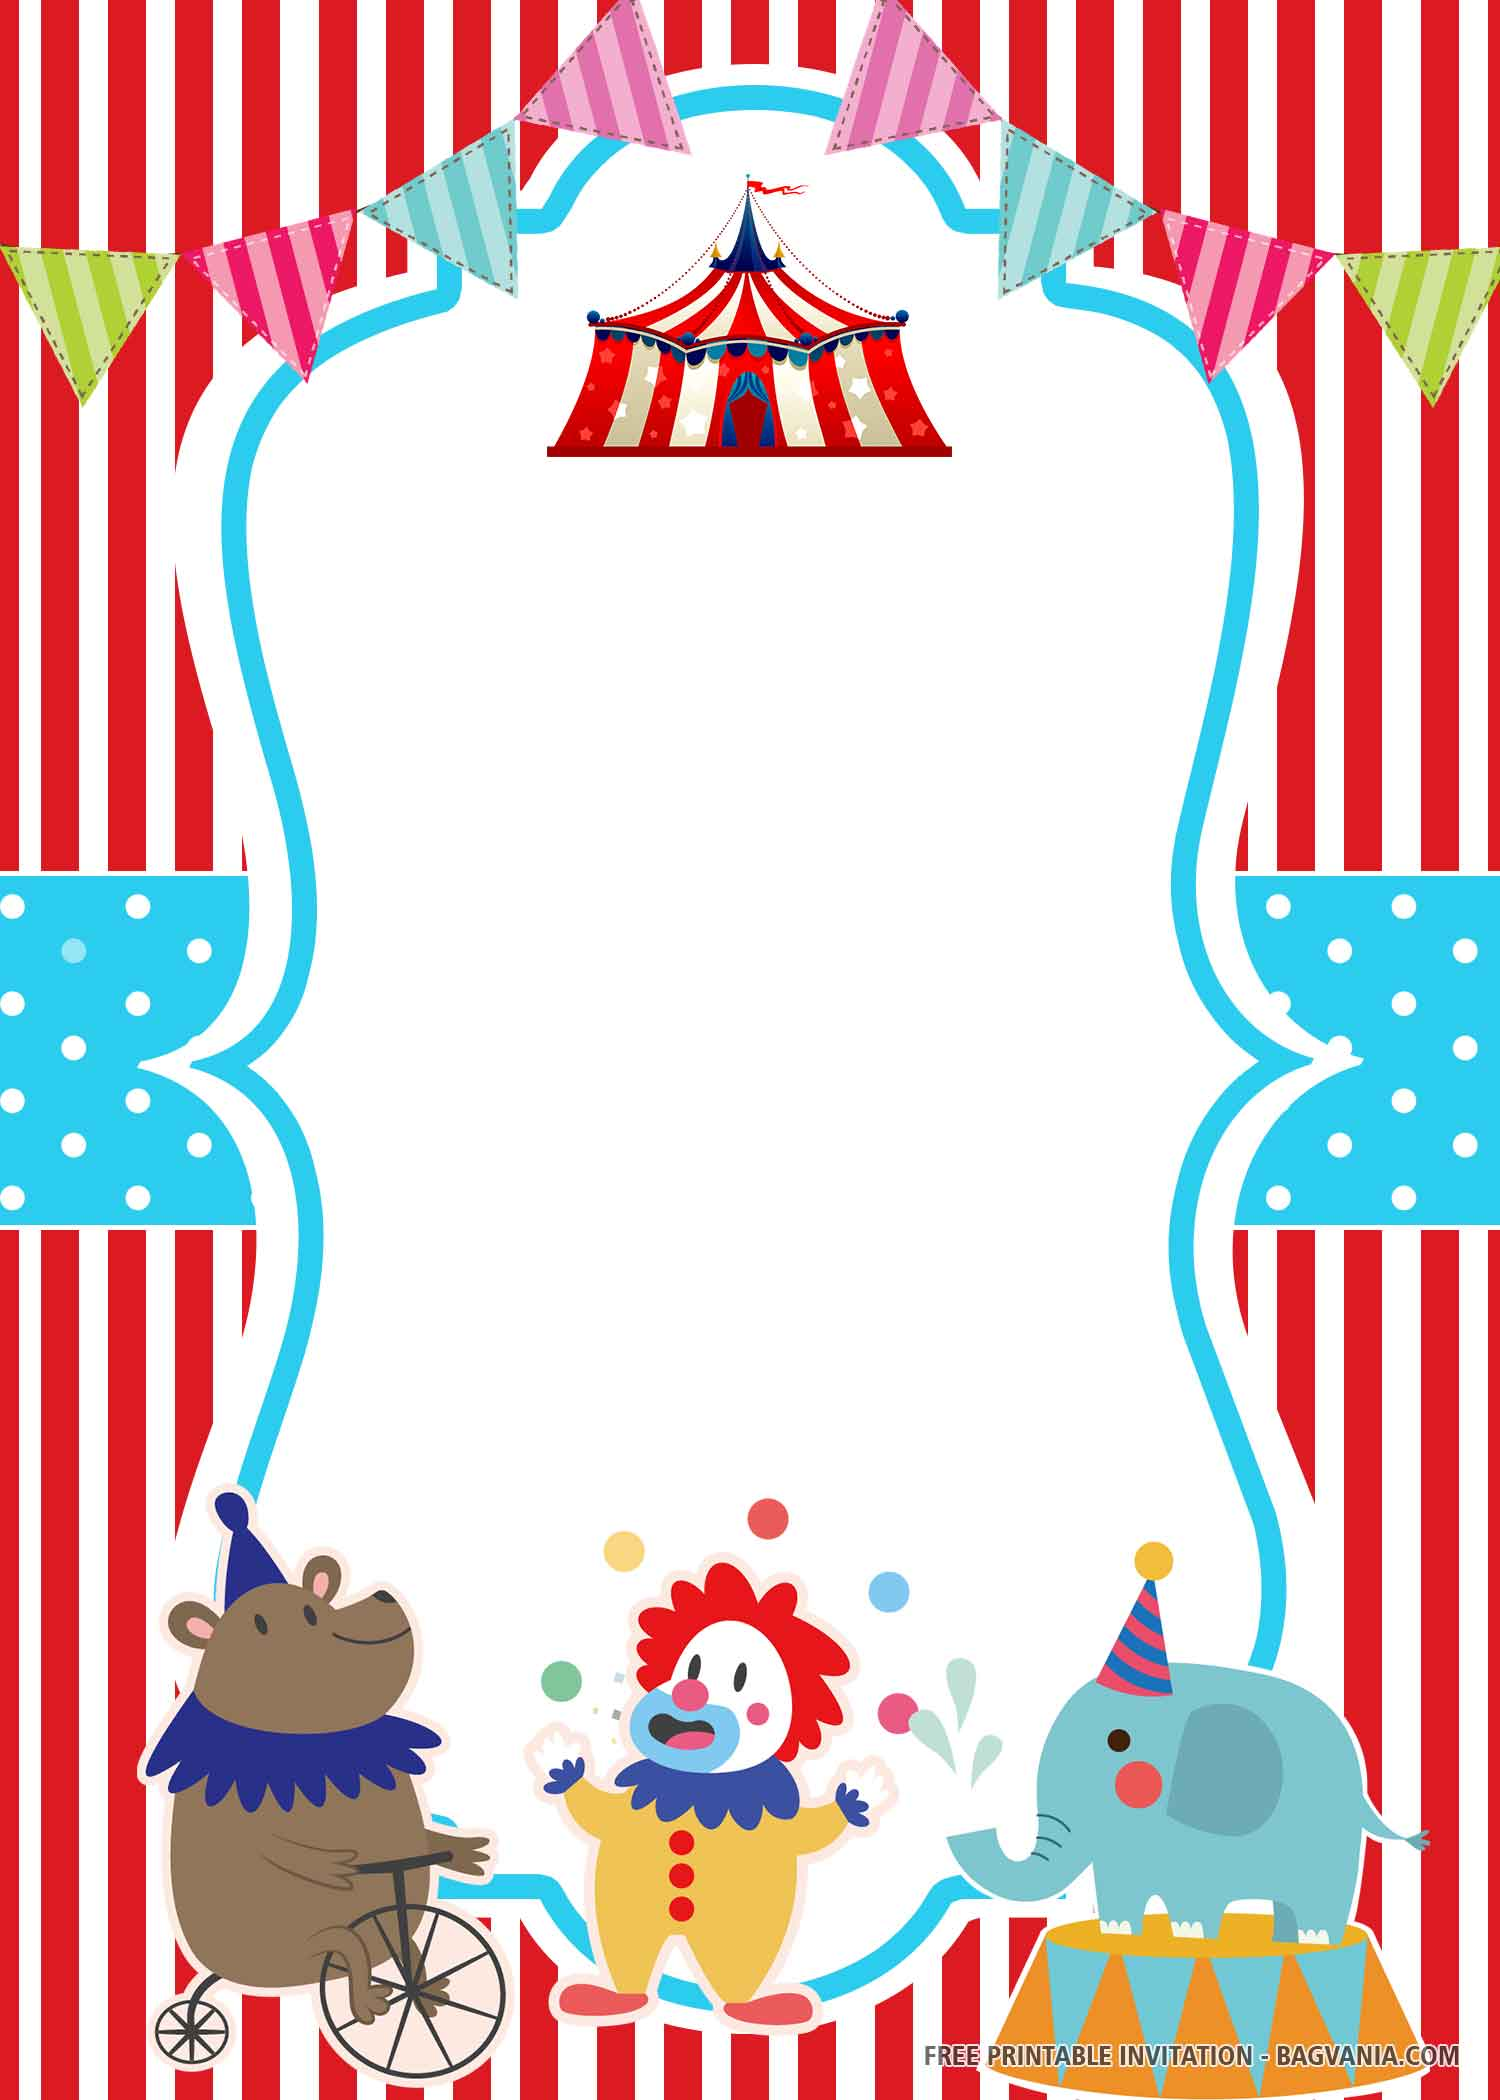 Free Printable Stripes Circus Birthday Invitation